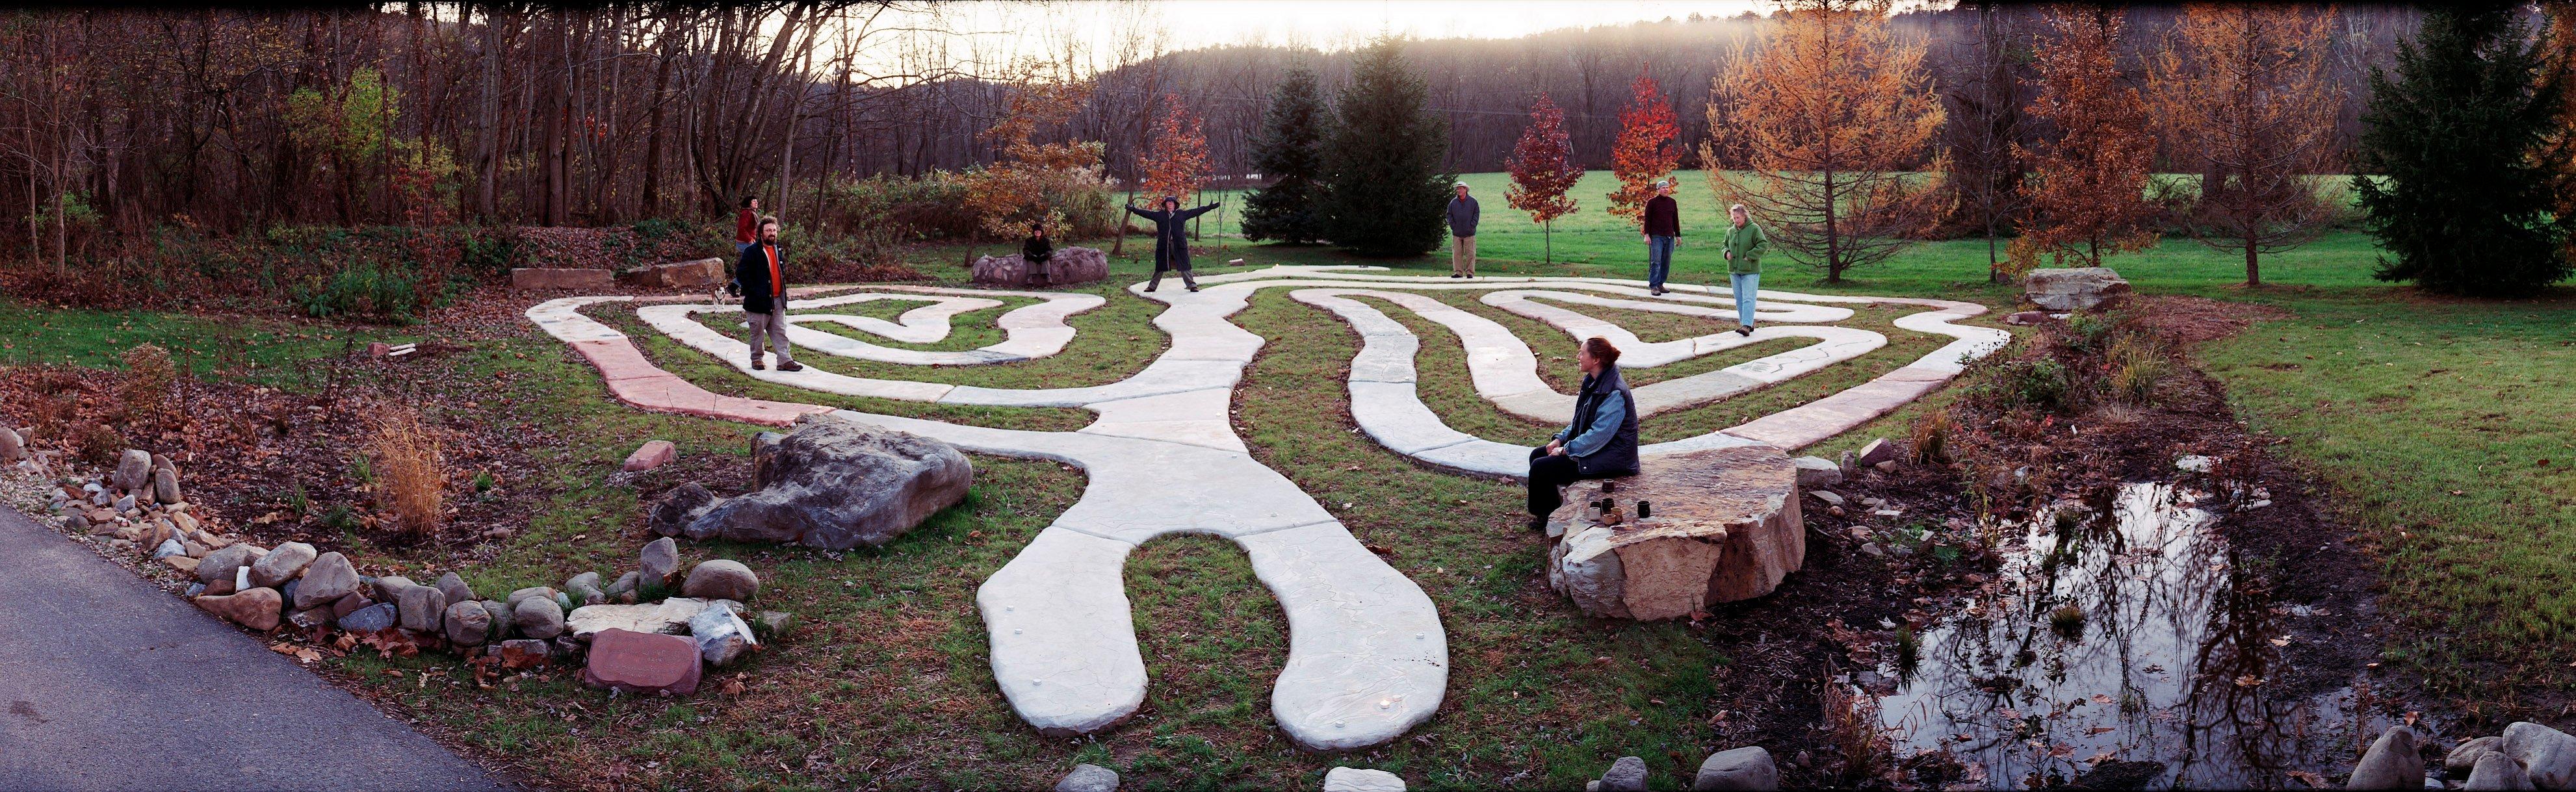 RiverWise Labyrinth